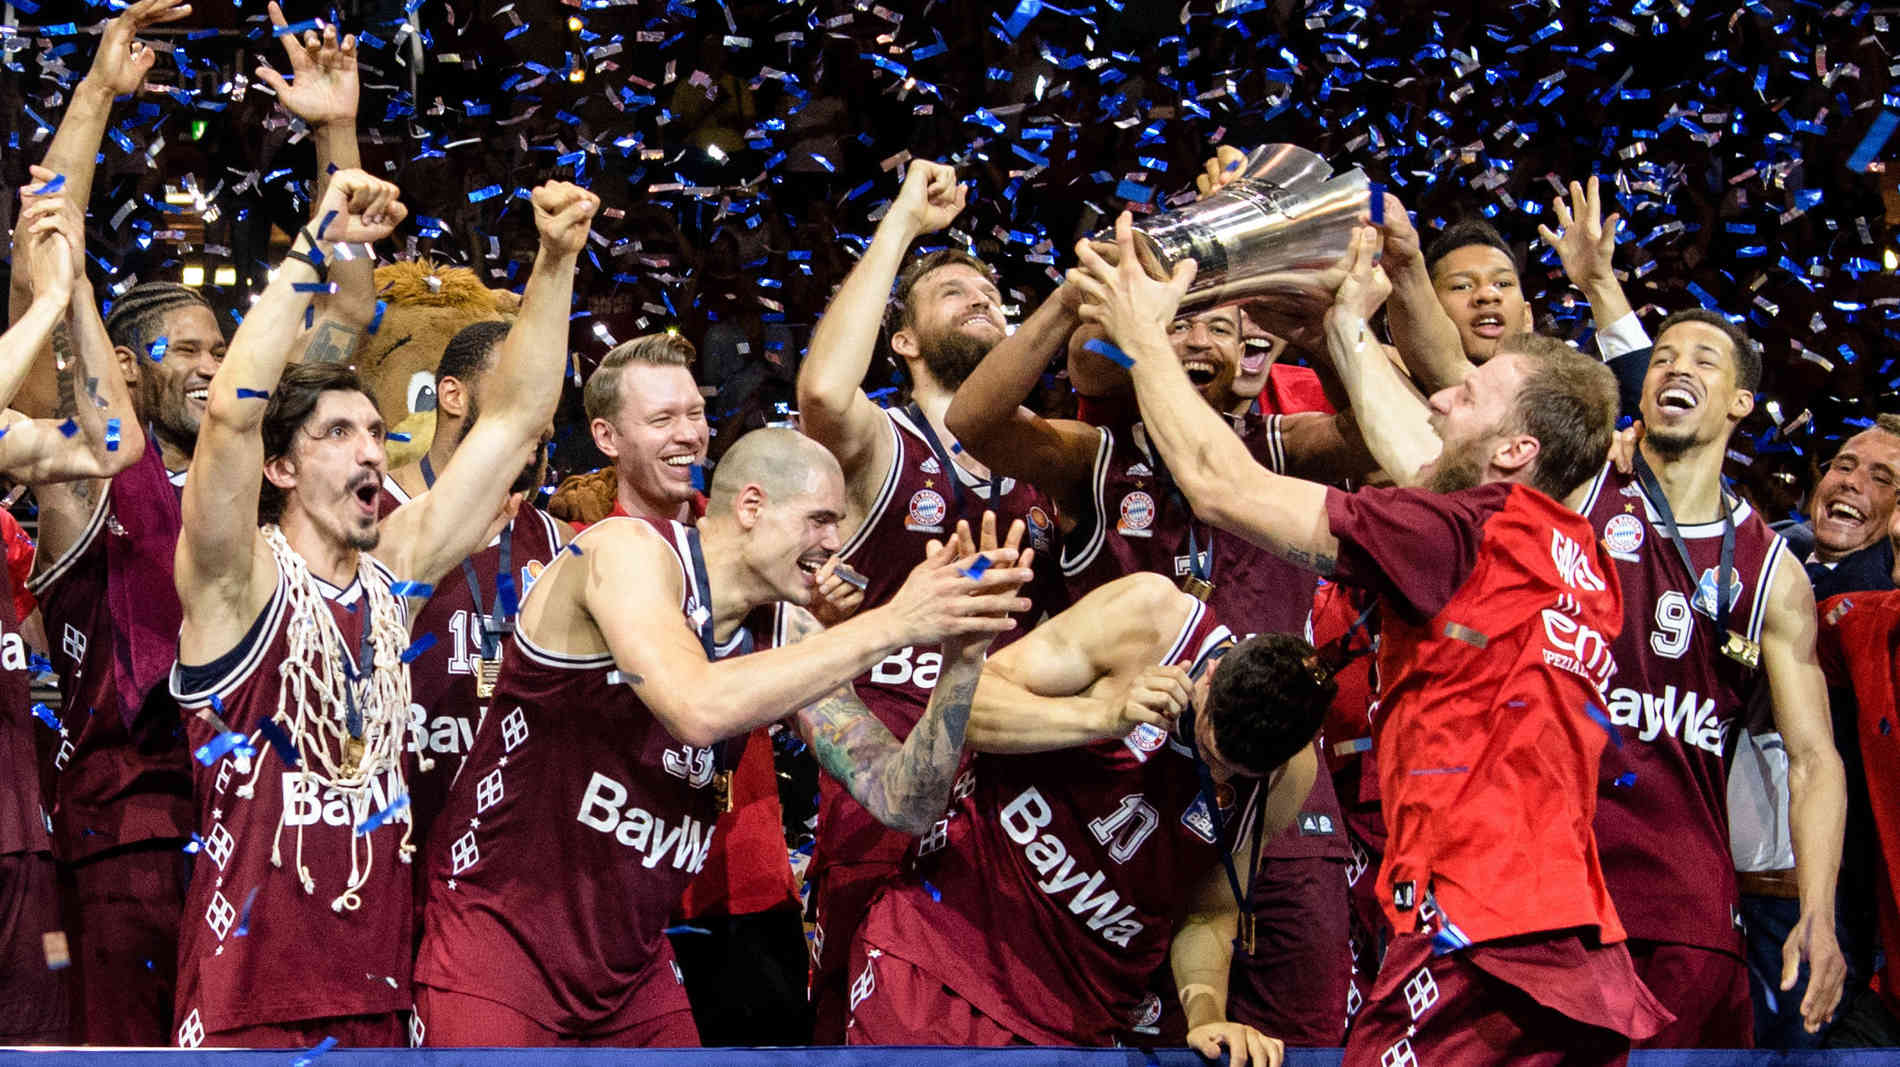 Bayern Basketball